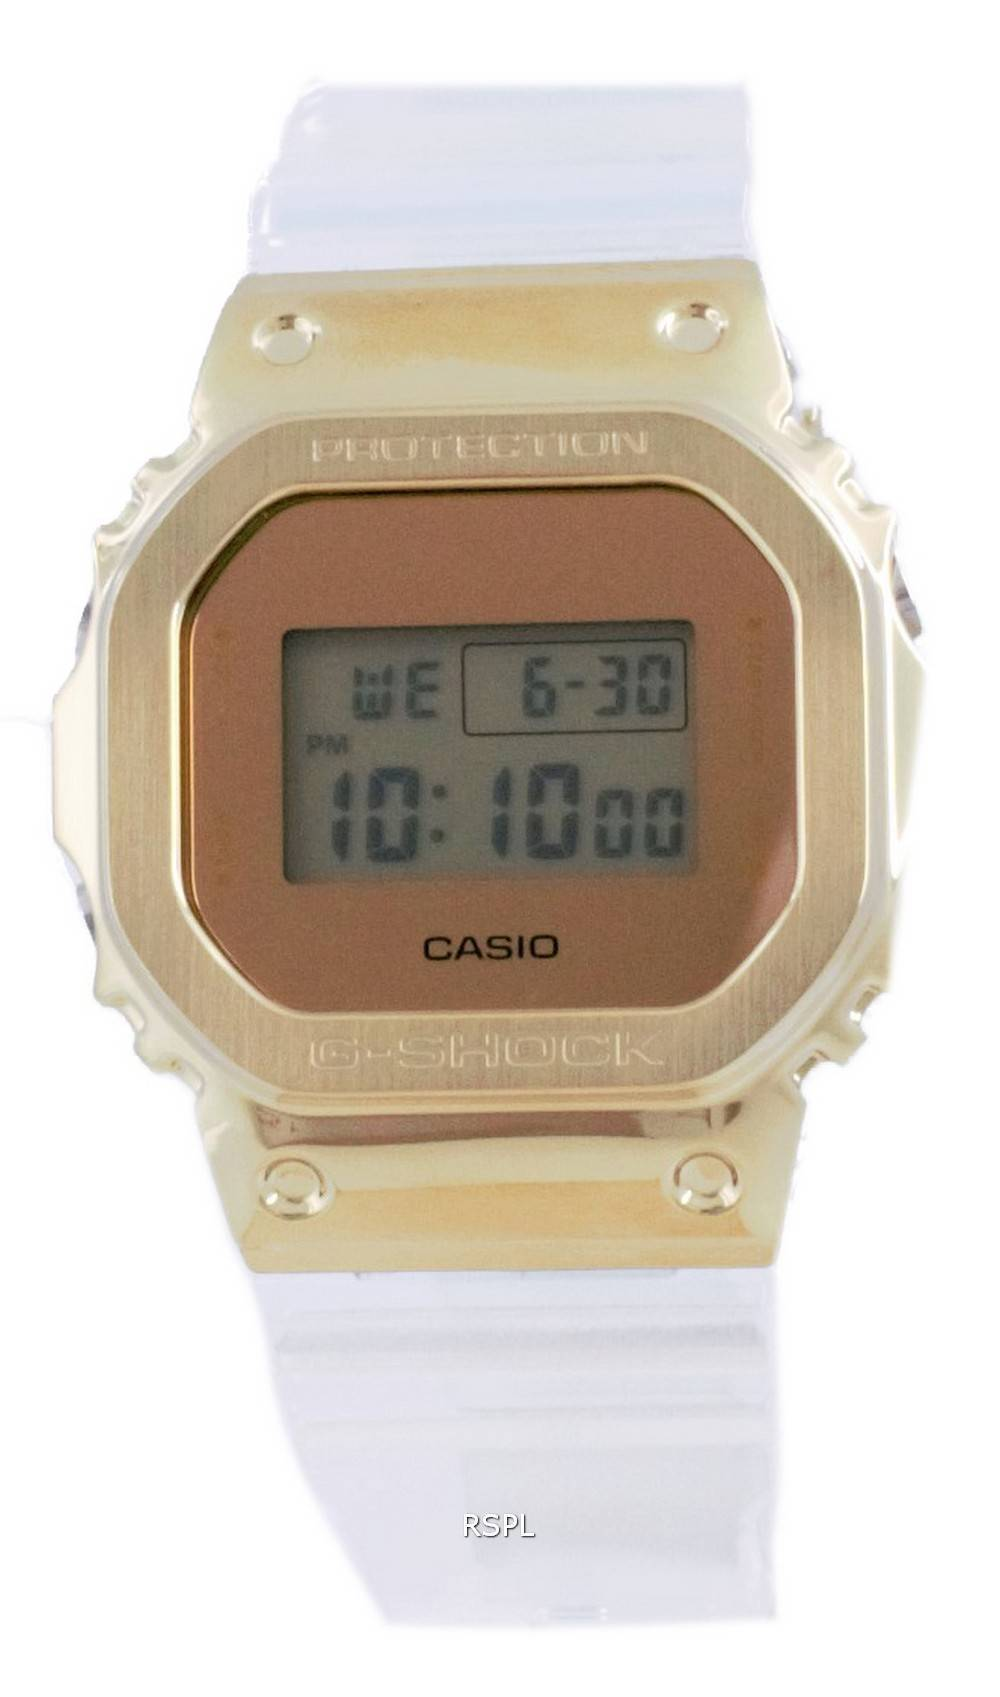 Casio G-Shock Erivärinen digitaalinen sukeltaja GM-5600SG-9 GM5600SG-9 200M miesten kello